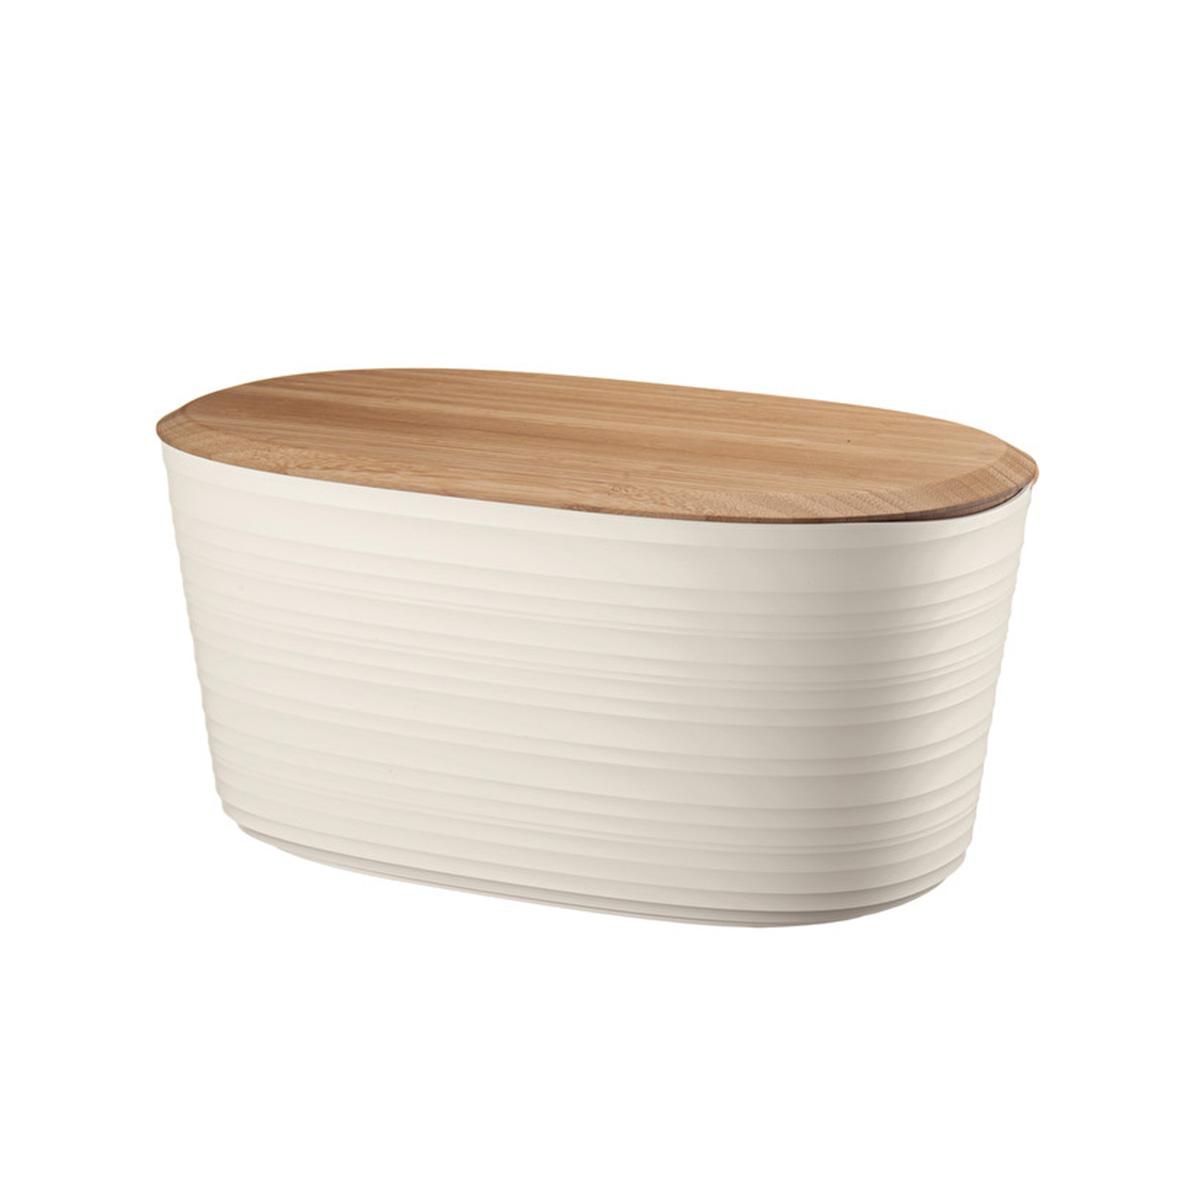 Kutija za hleb Tierra bela 1796.00.156